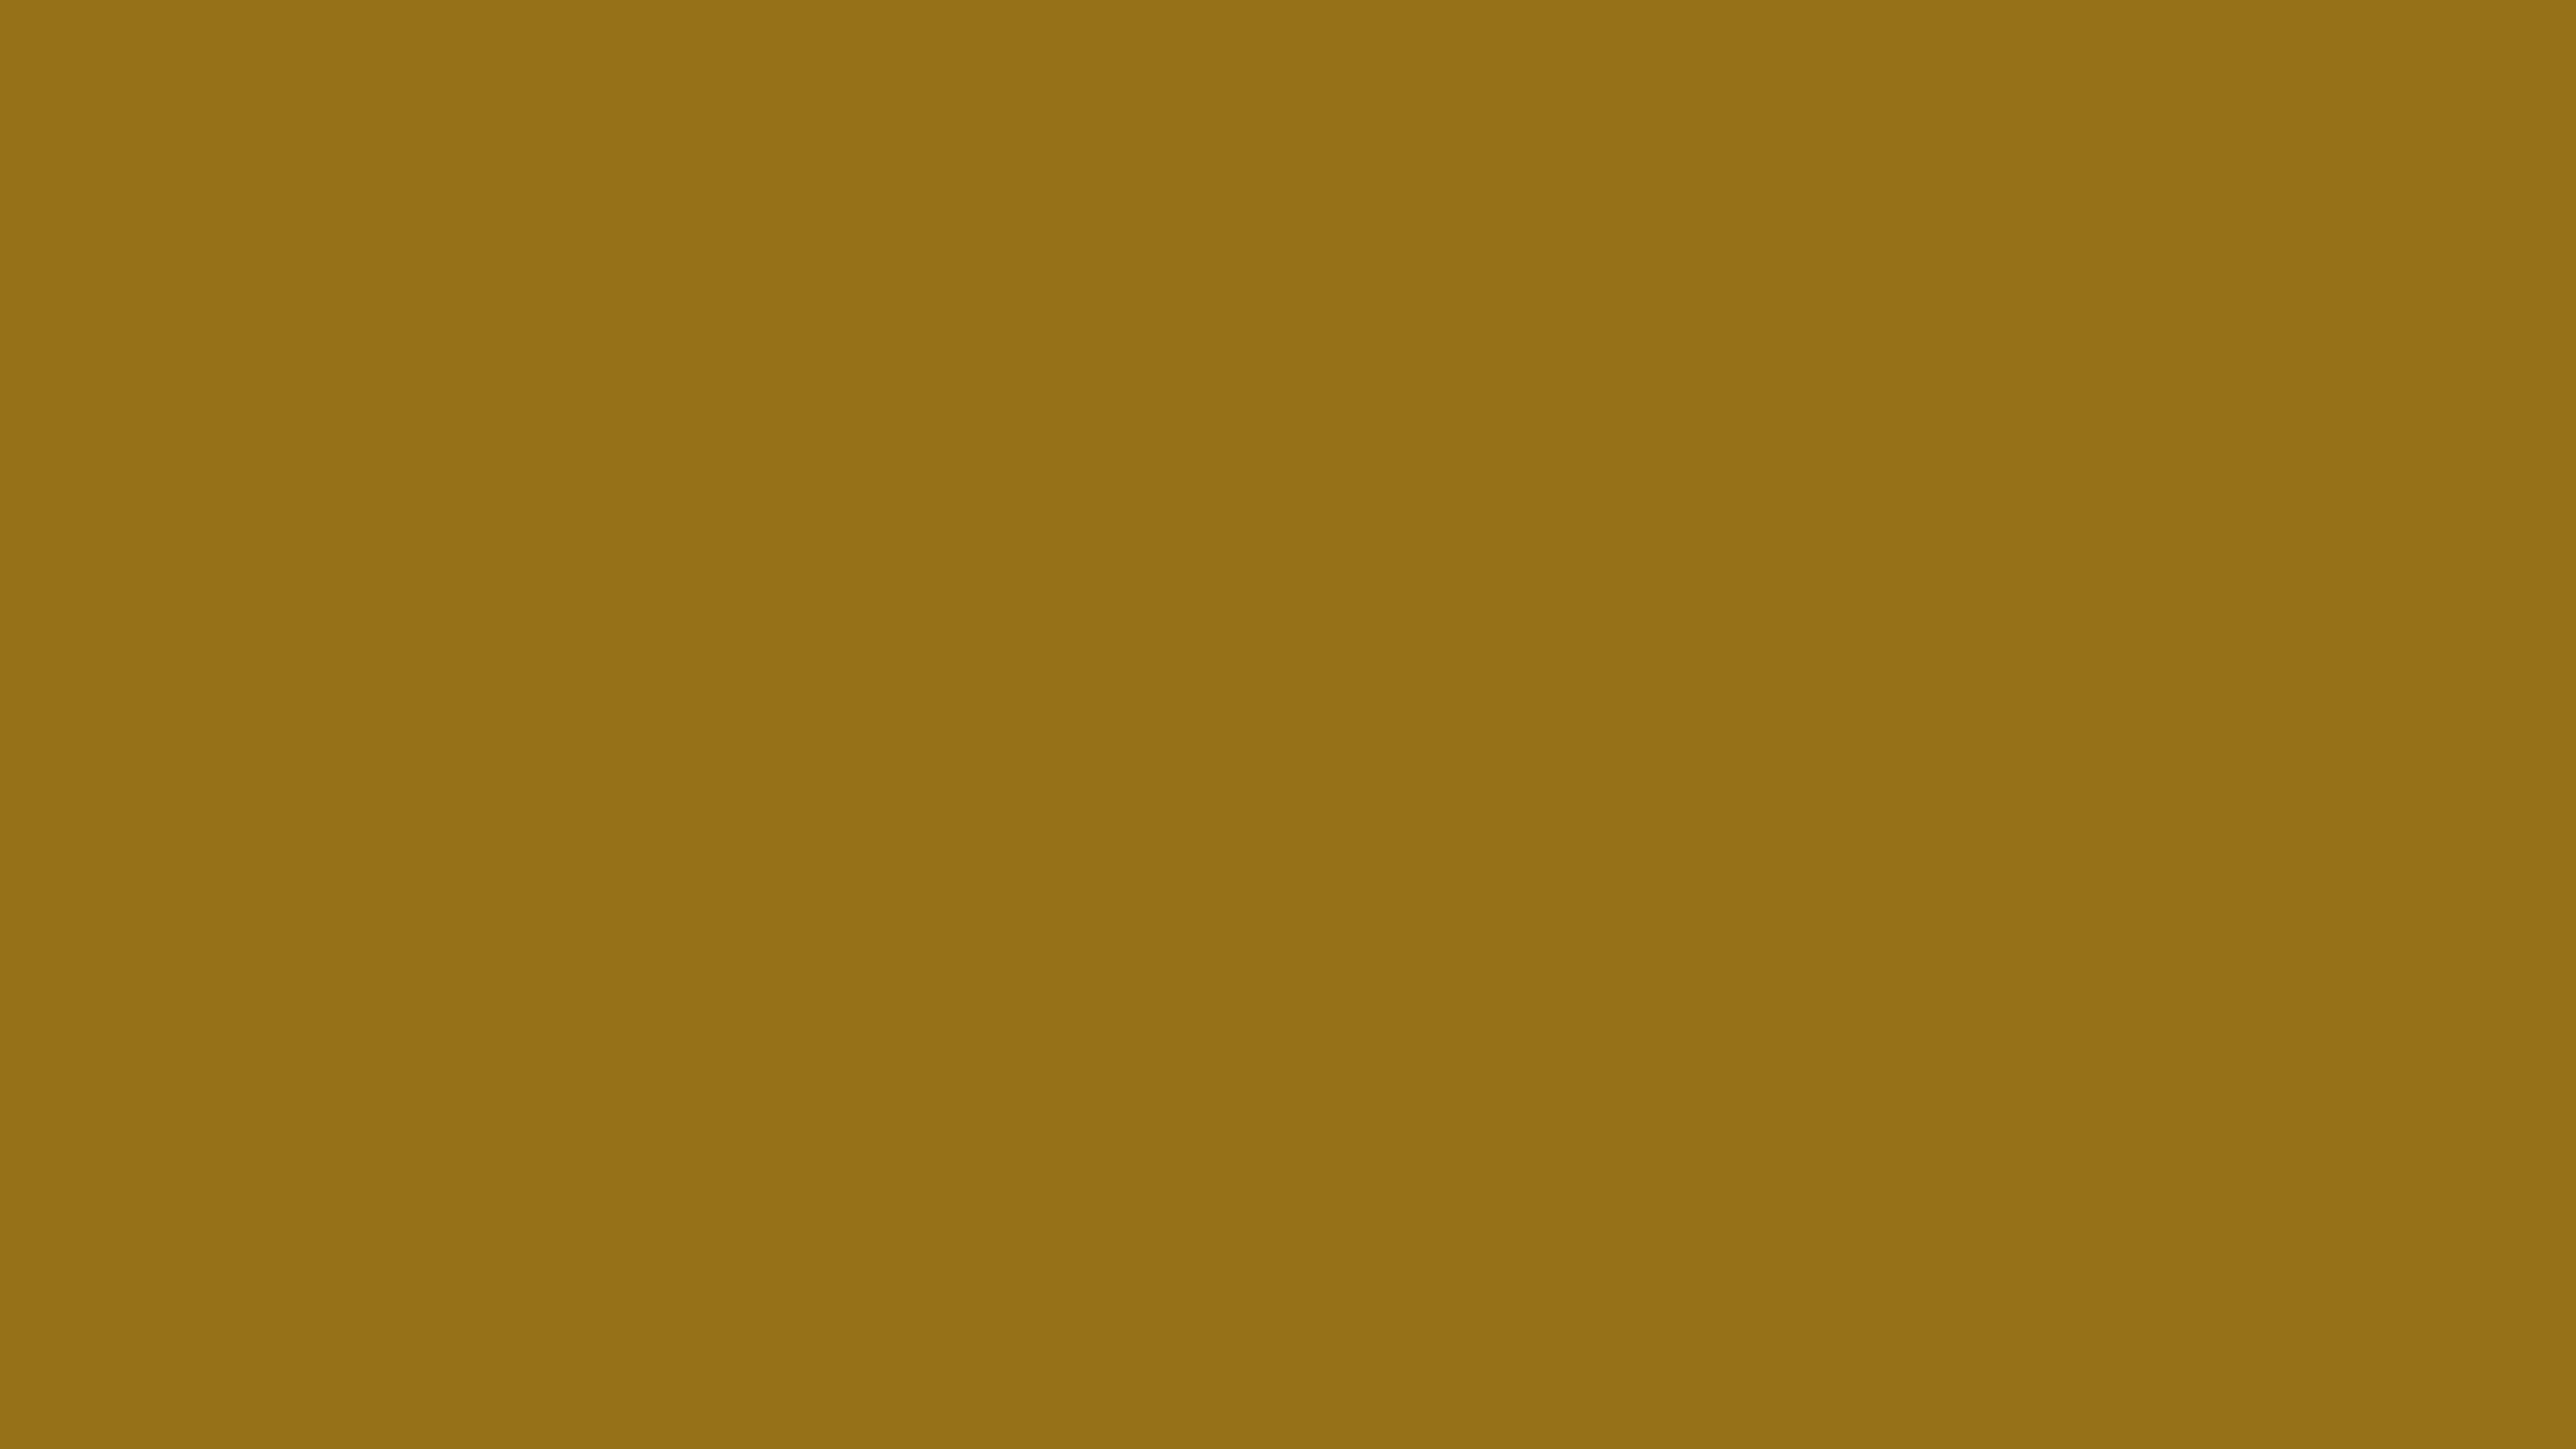 7680x4320 Mode Beige Solid Color Background